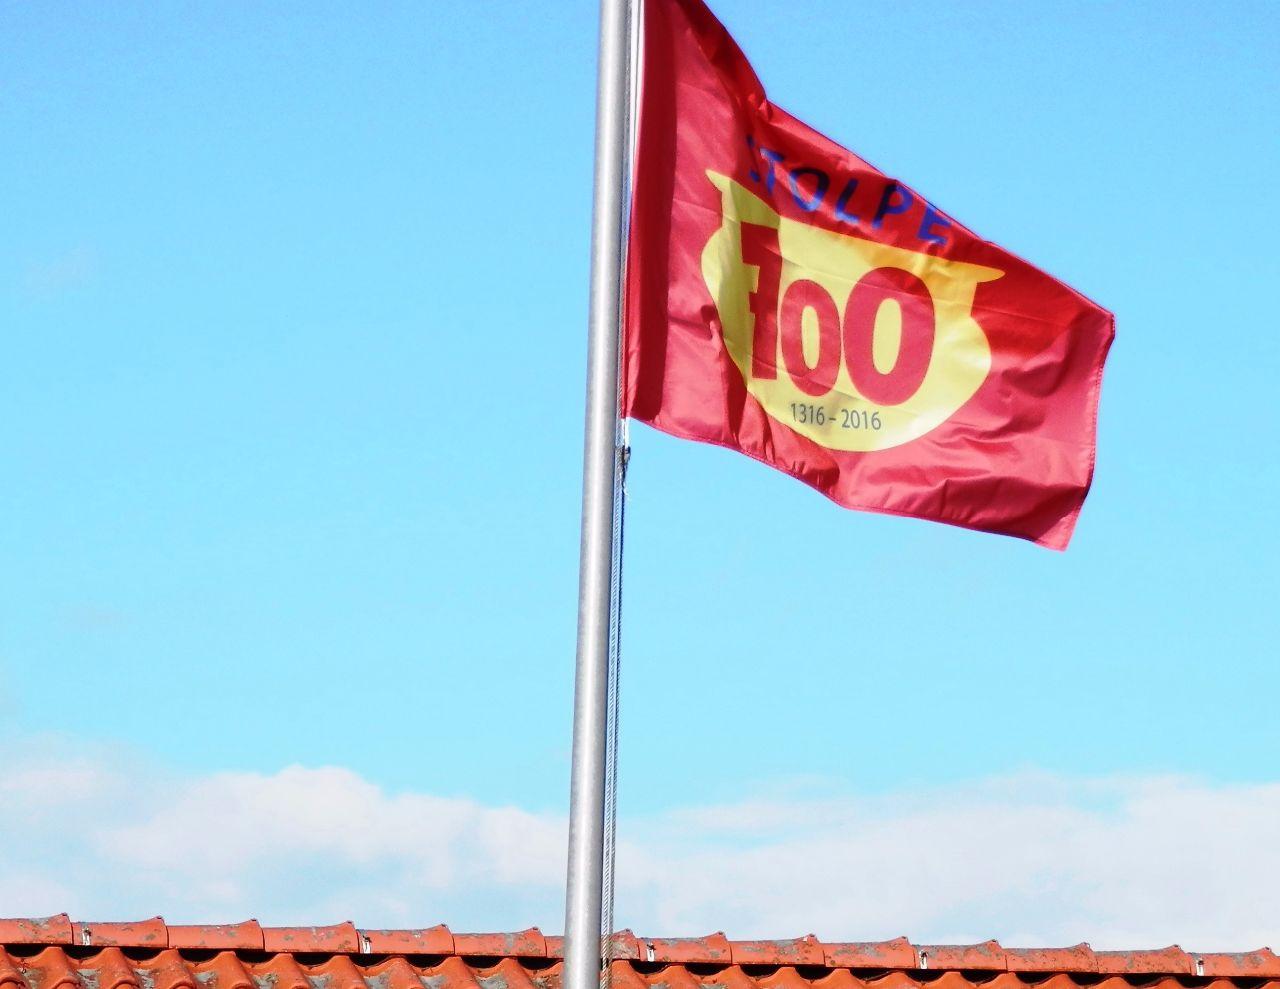 Flagge an der Schule